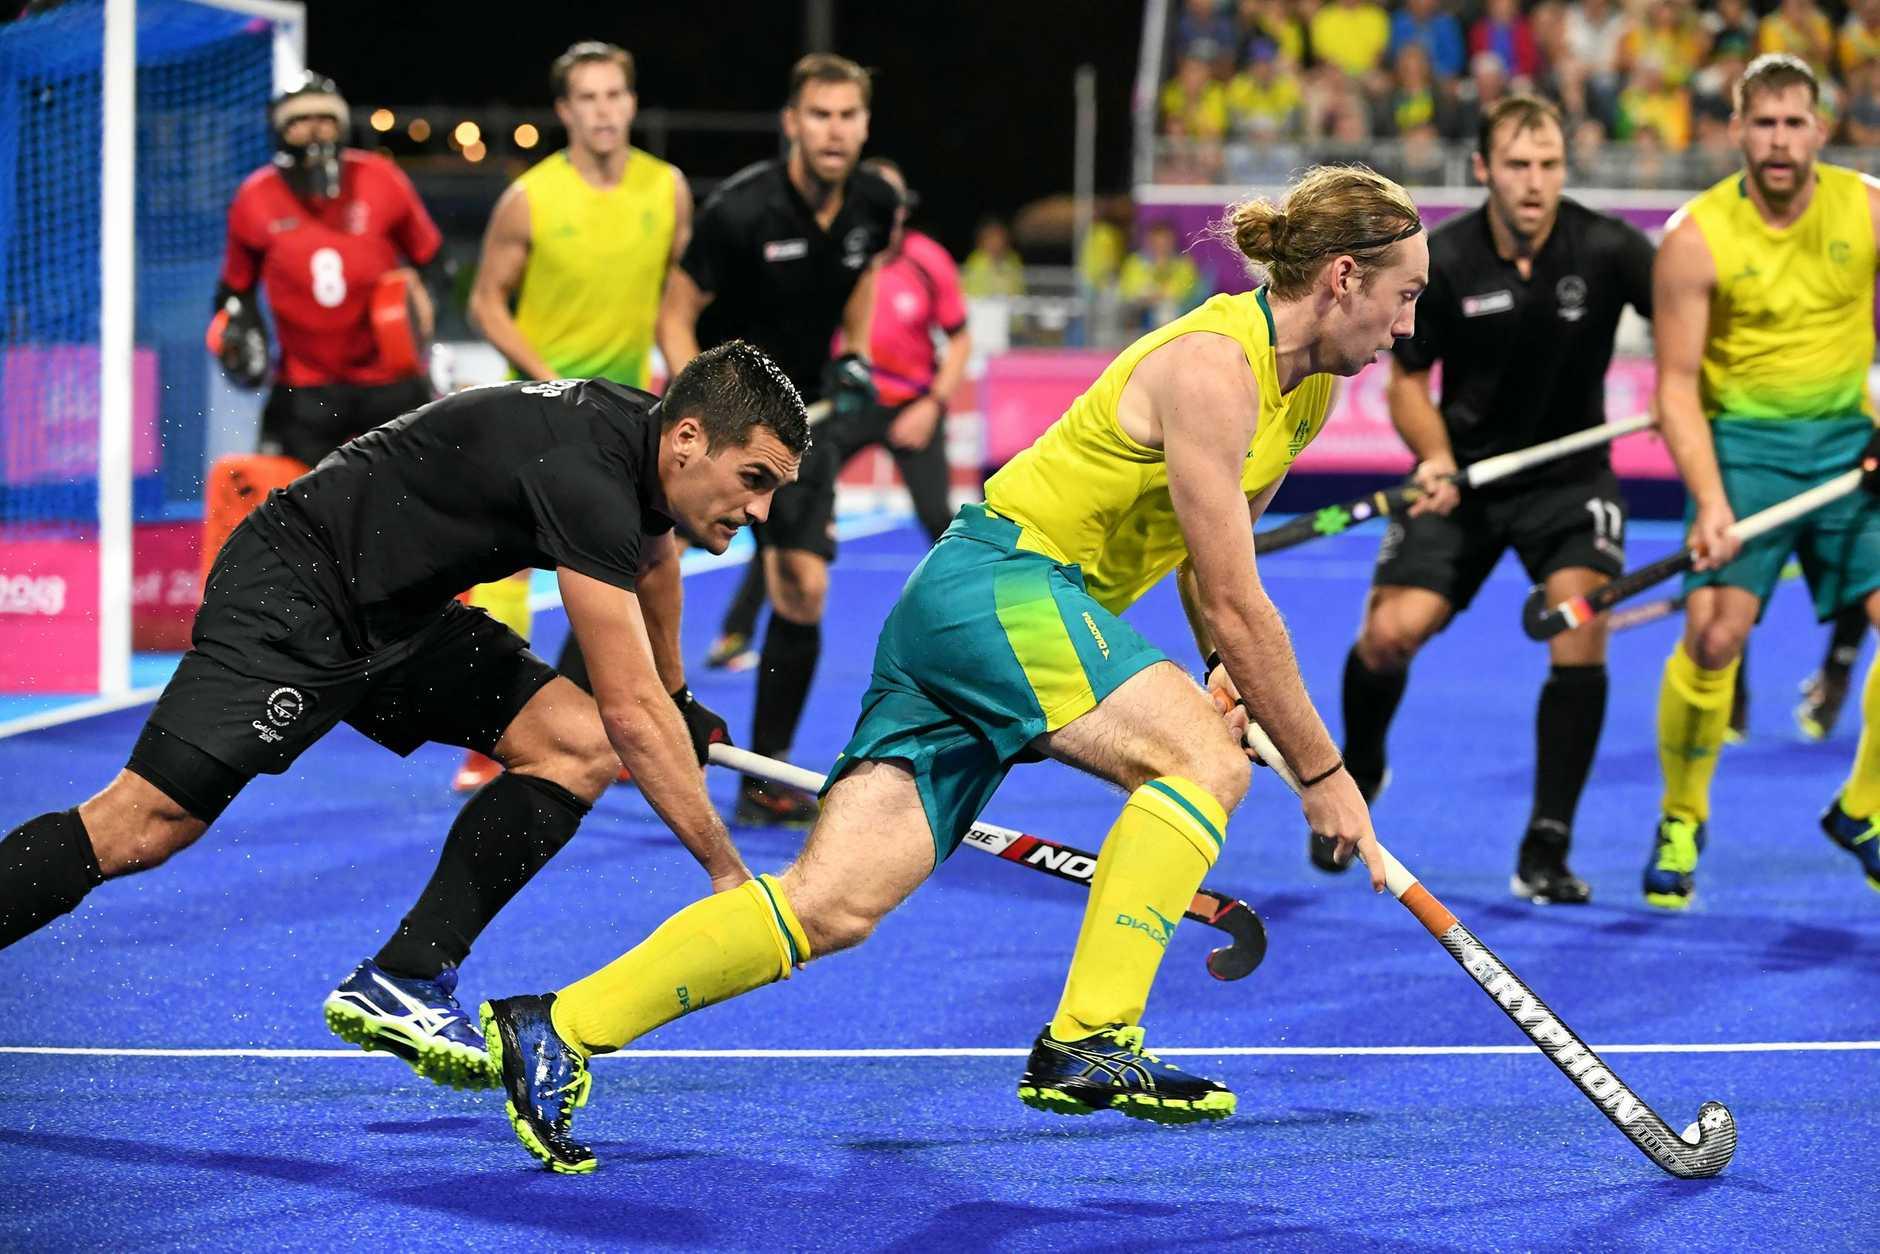 Oceania Cup a coup for Rocky: Hockey Australia boss